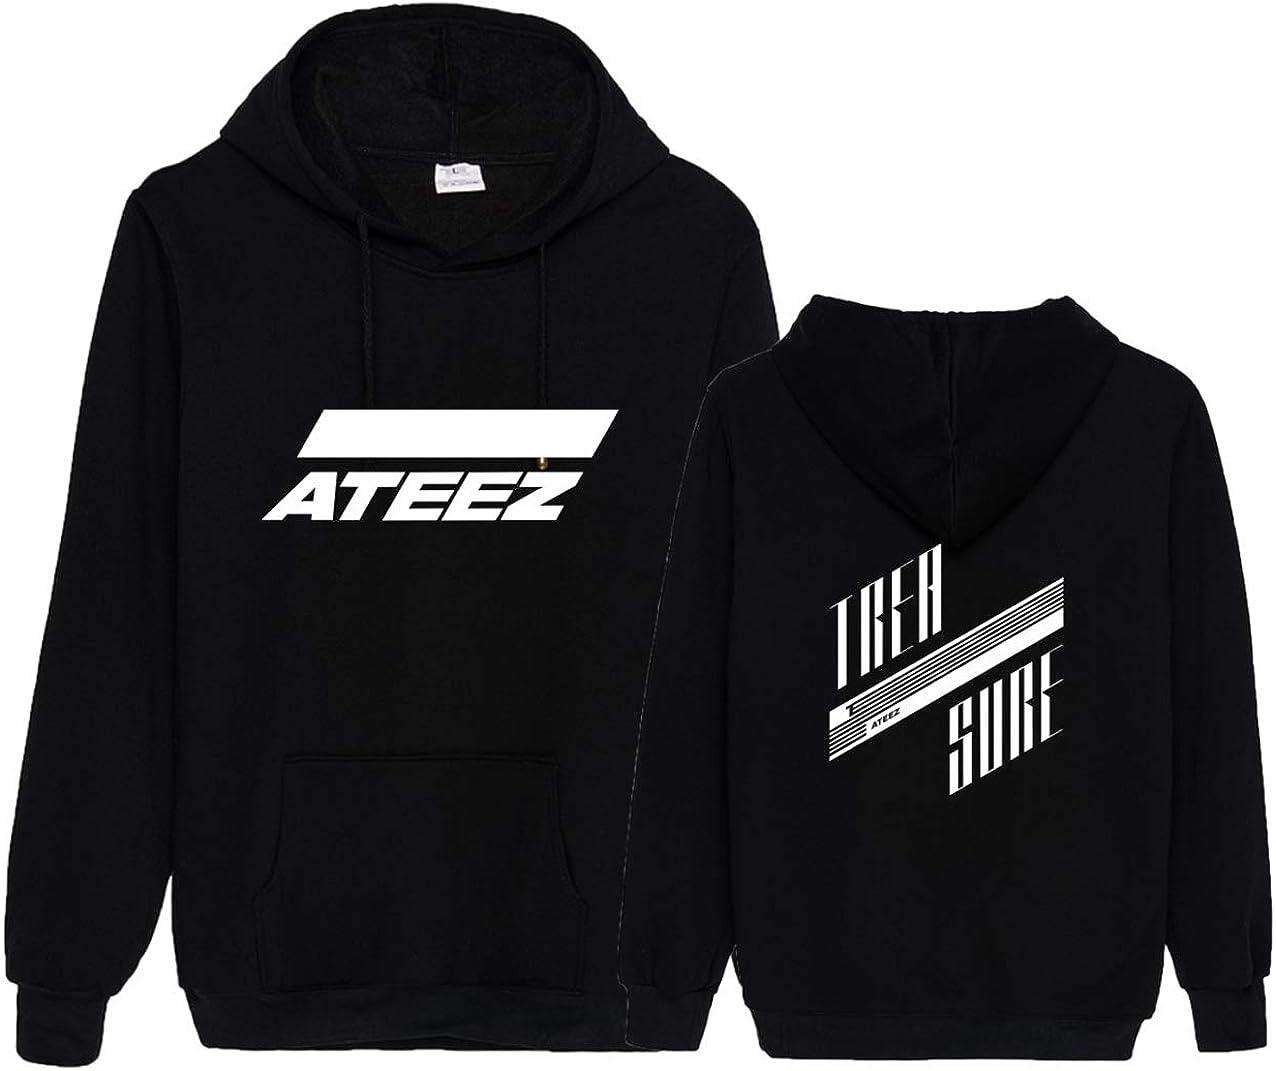 CHAIRAY Kpop ATEEZ Album Treasure Hoodie Wooyoung San Mingi Yeosang Pullover Hooded Sweater